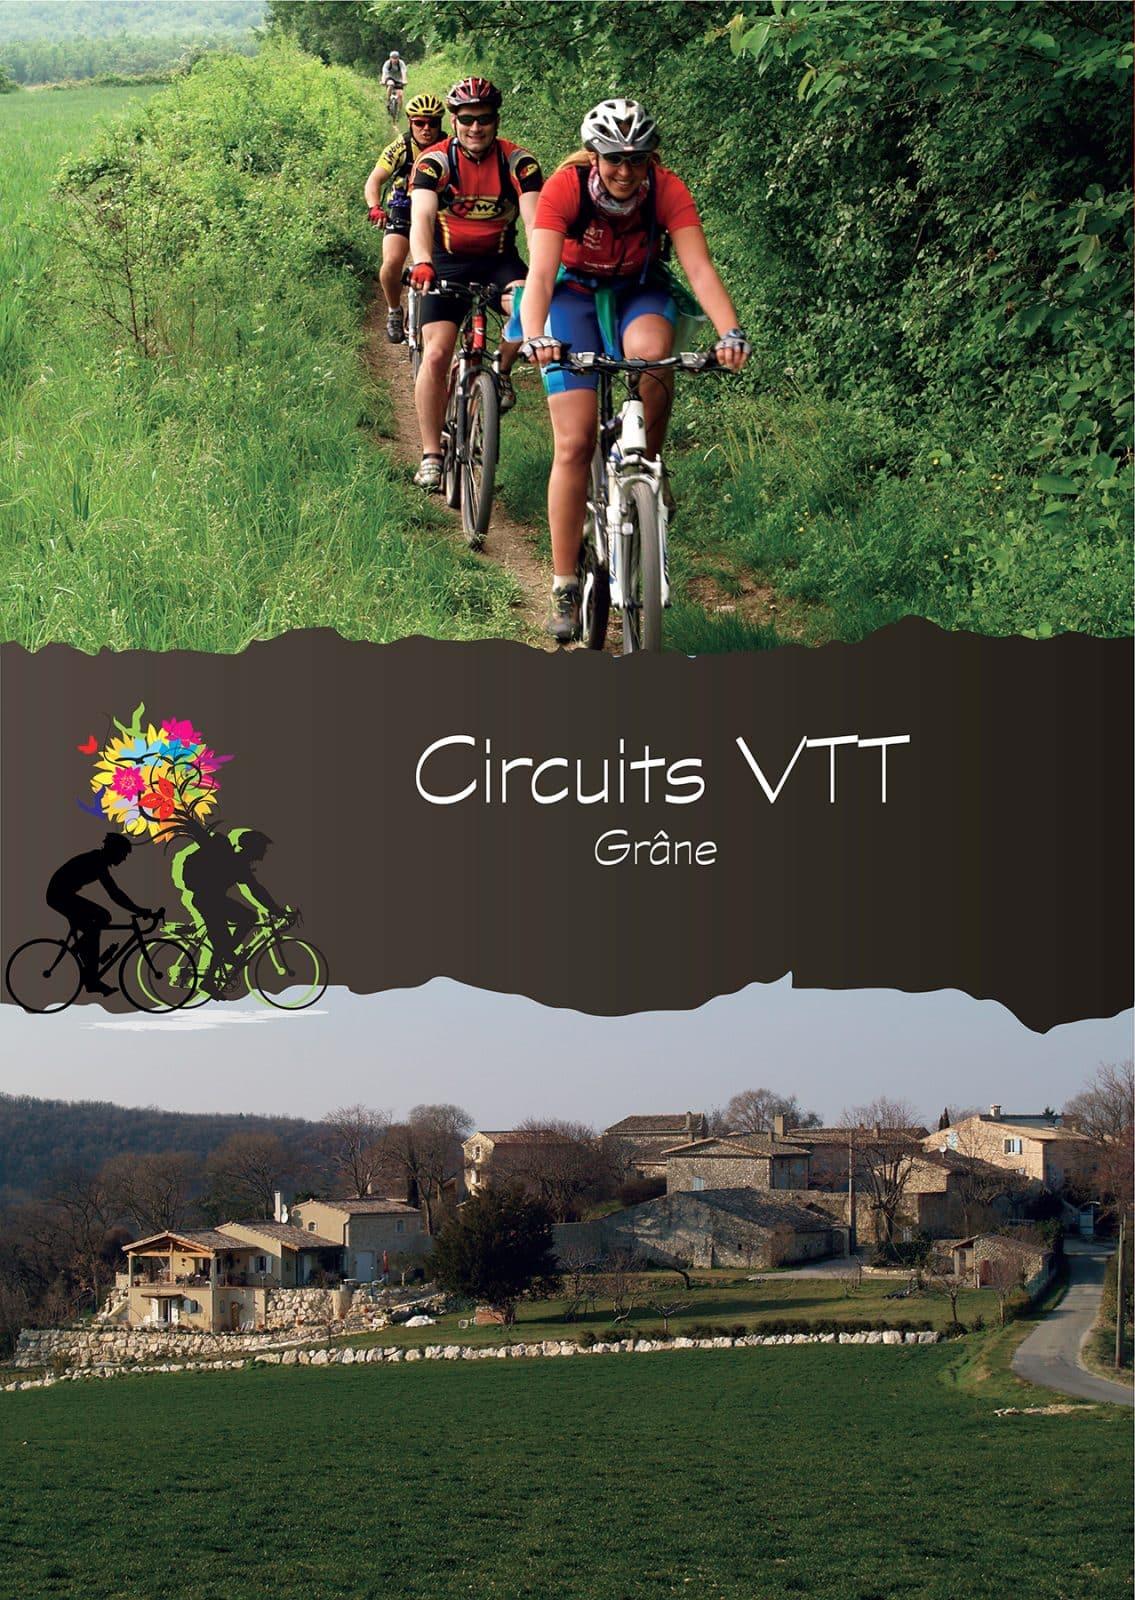 Couverture pochette Circuits VTT – Grâne